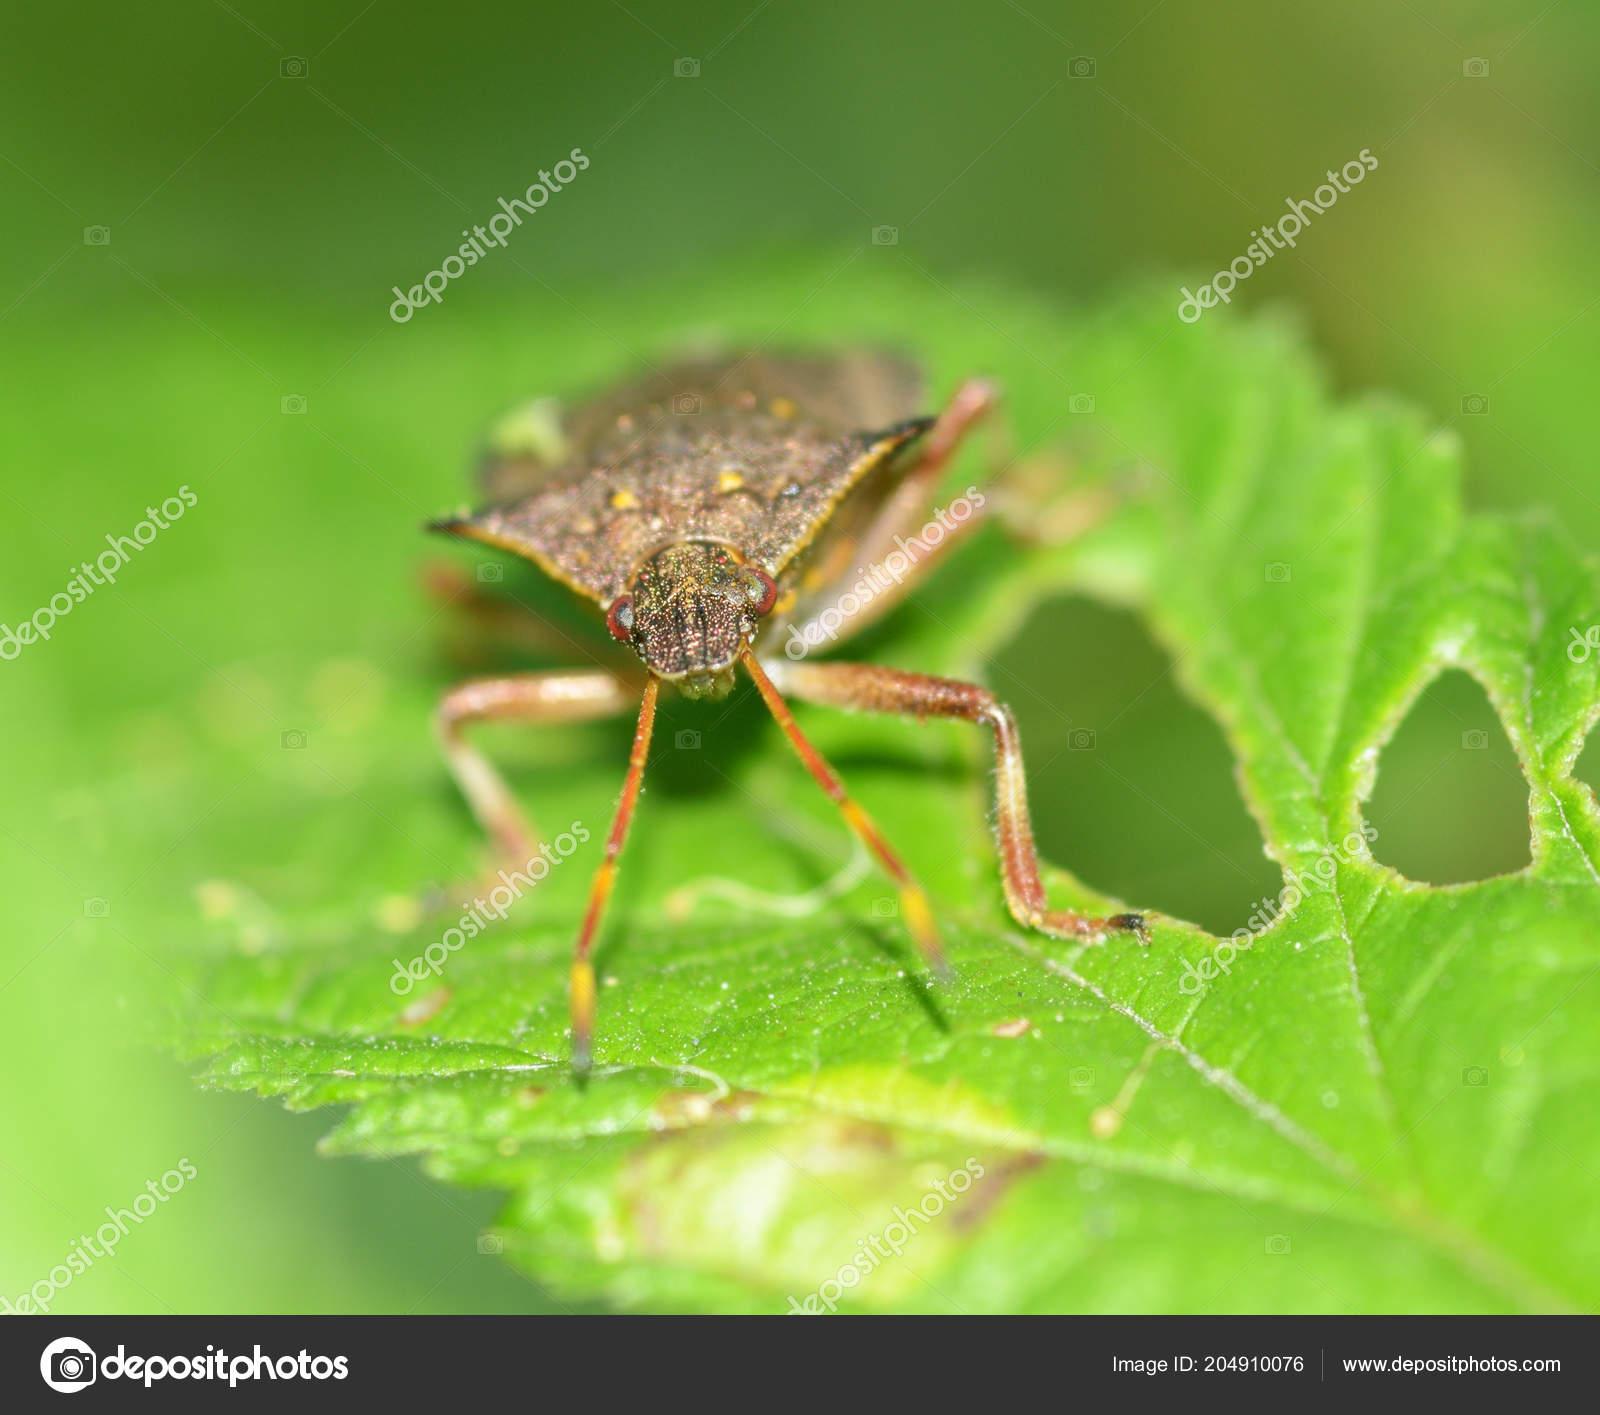 Forest Bug Sitting On A BranchHe Hunts PreyIts Bloodsucker Insect Photo By Parasunakyandexru